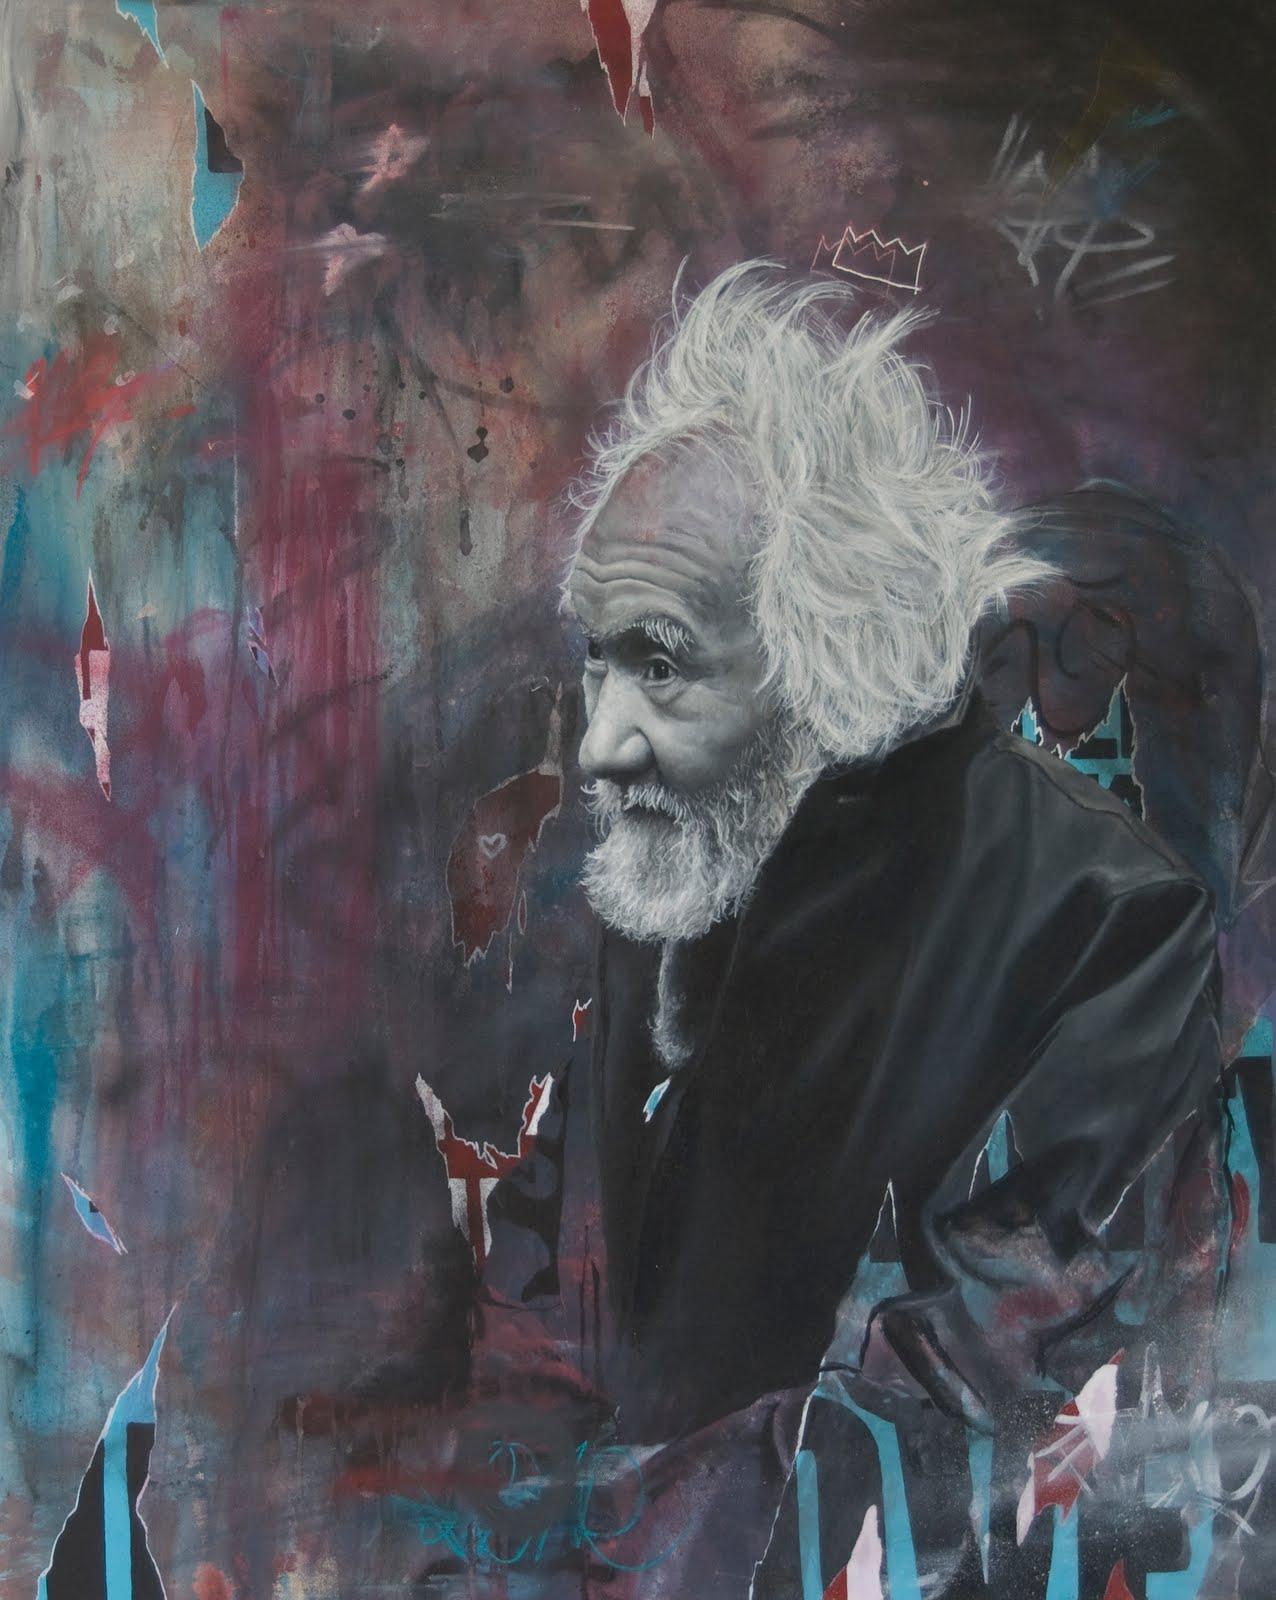 art blog - Pedro Matos - Empty Kingdom